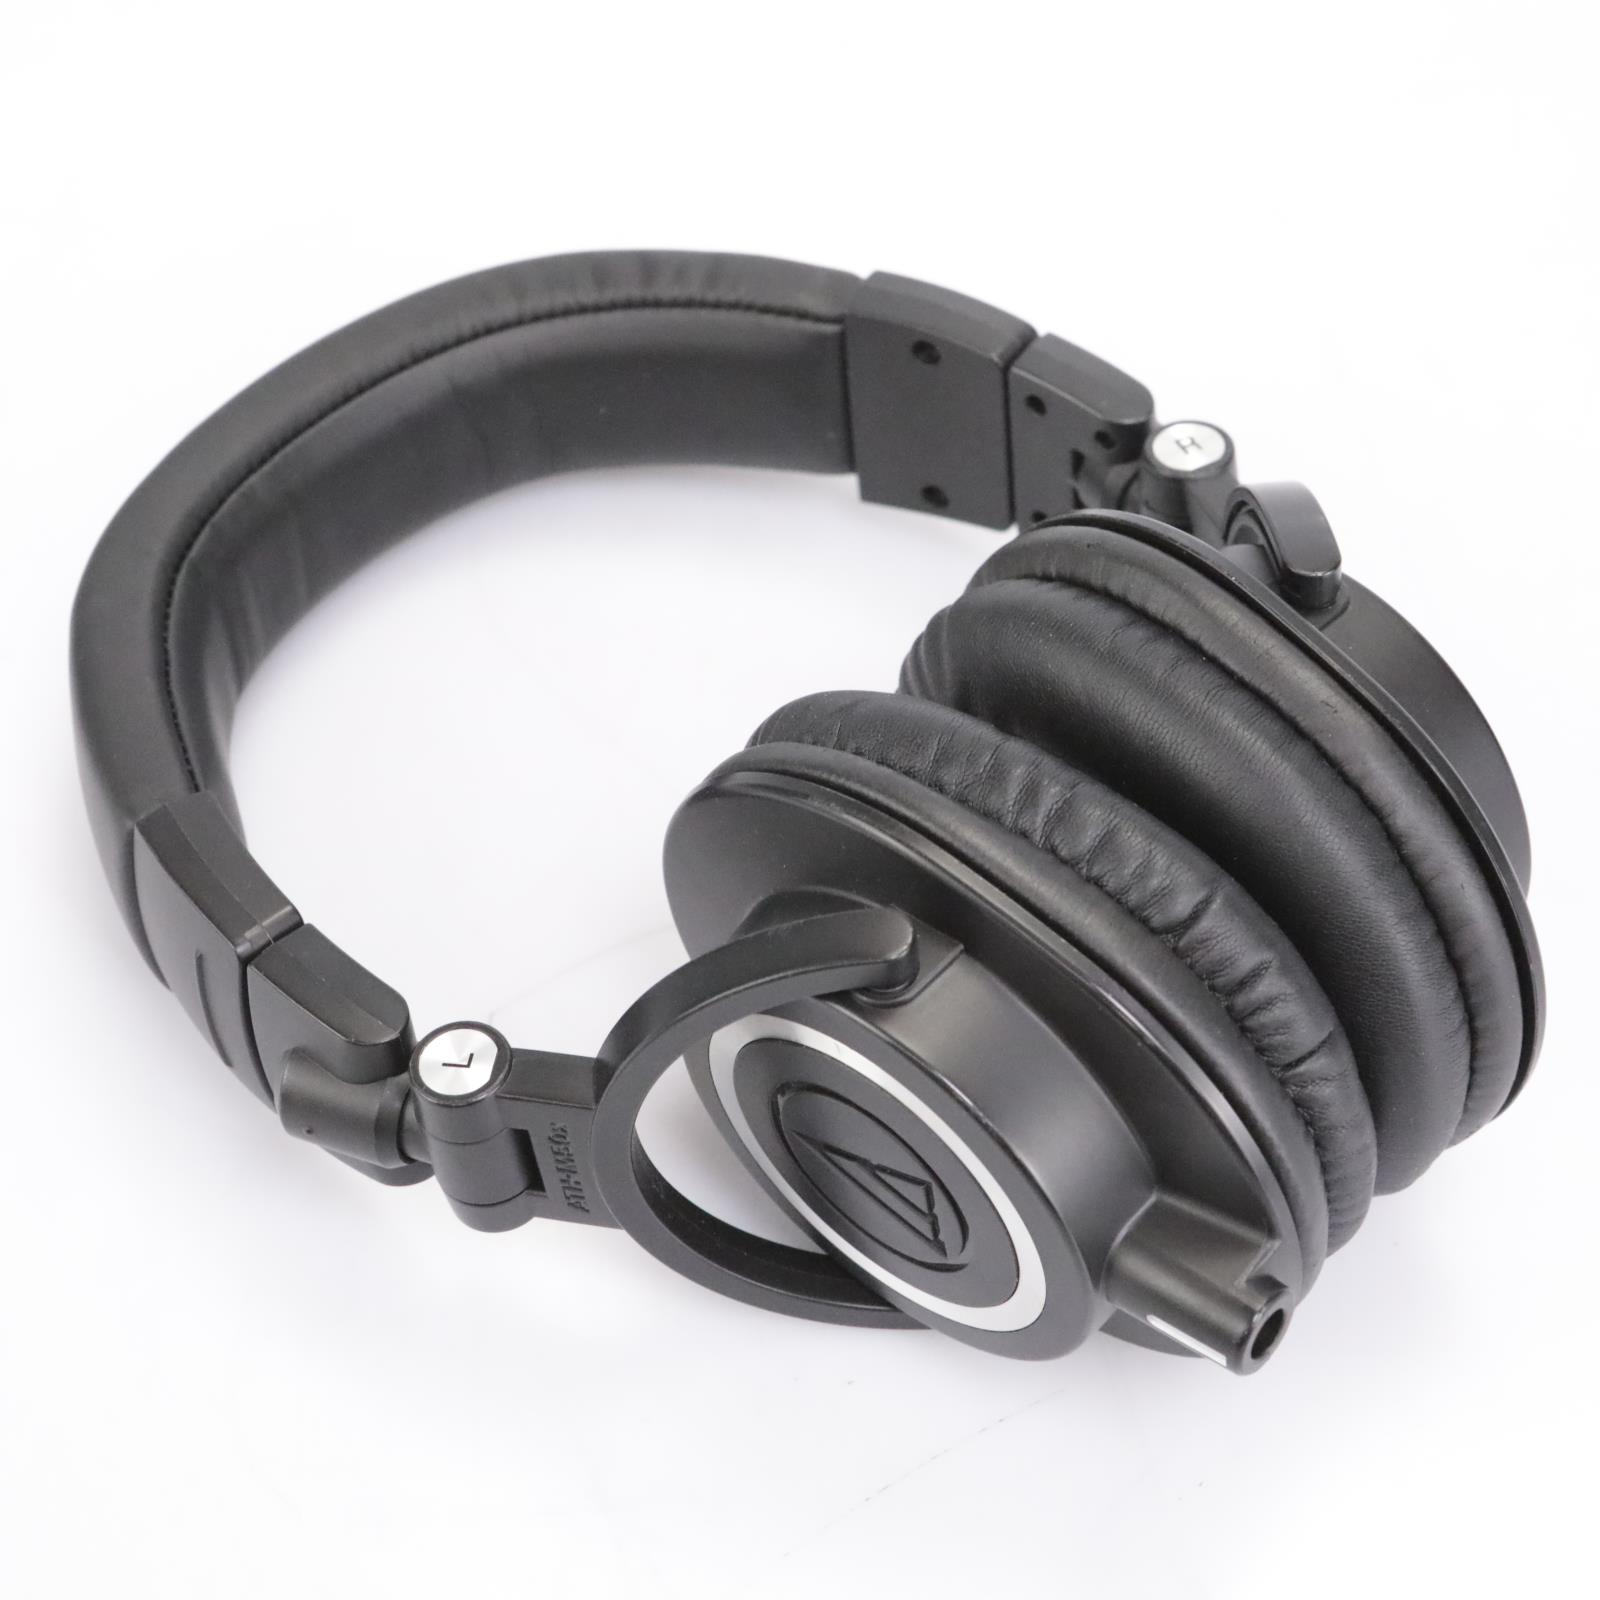 Audio-Technica ATH-M50X Professional Monitor Headphones #43529